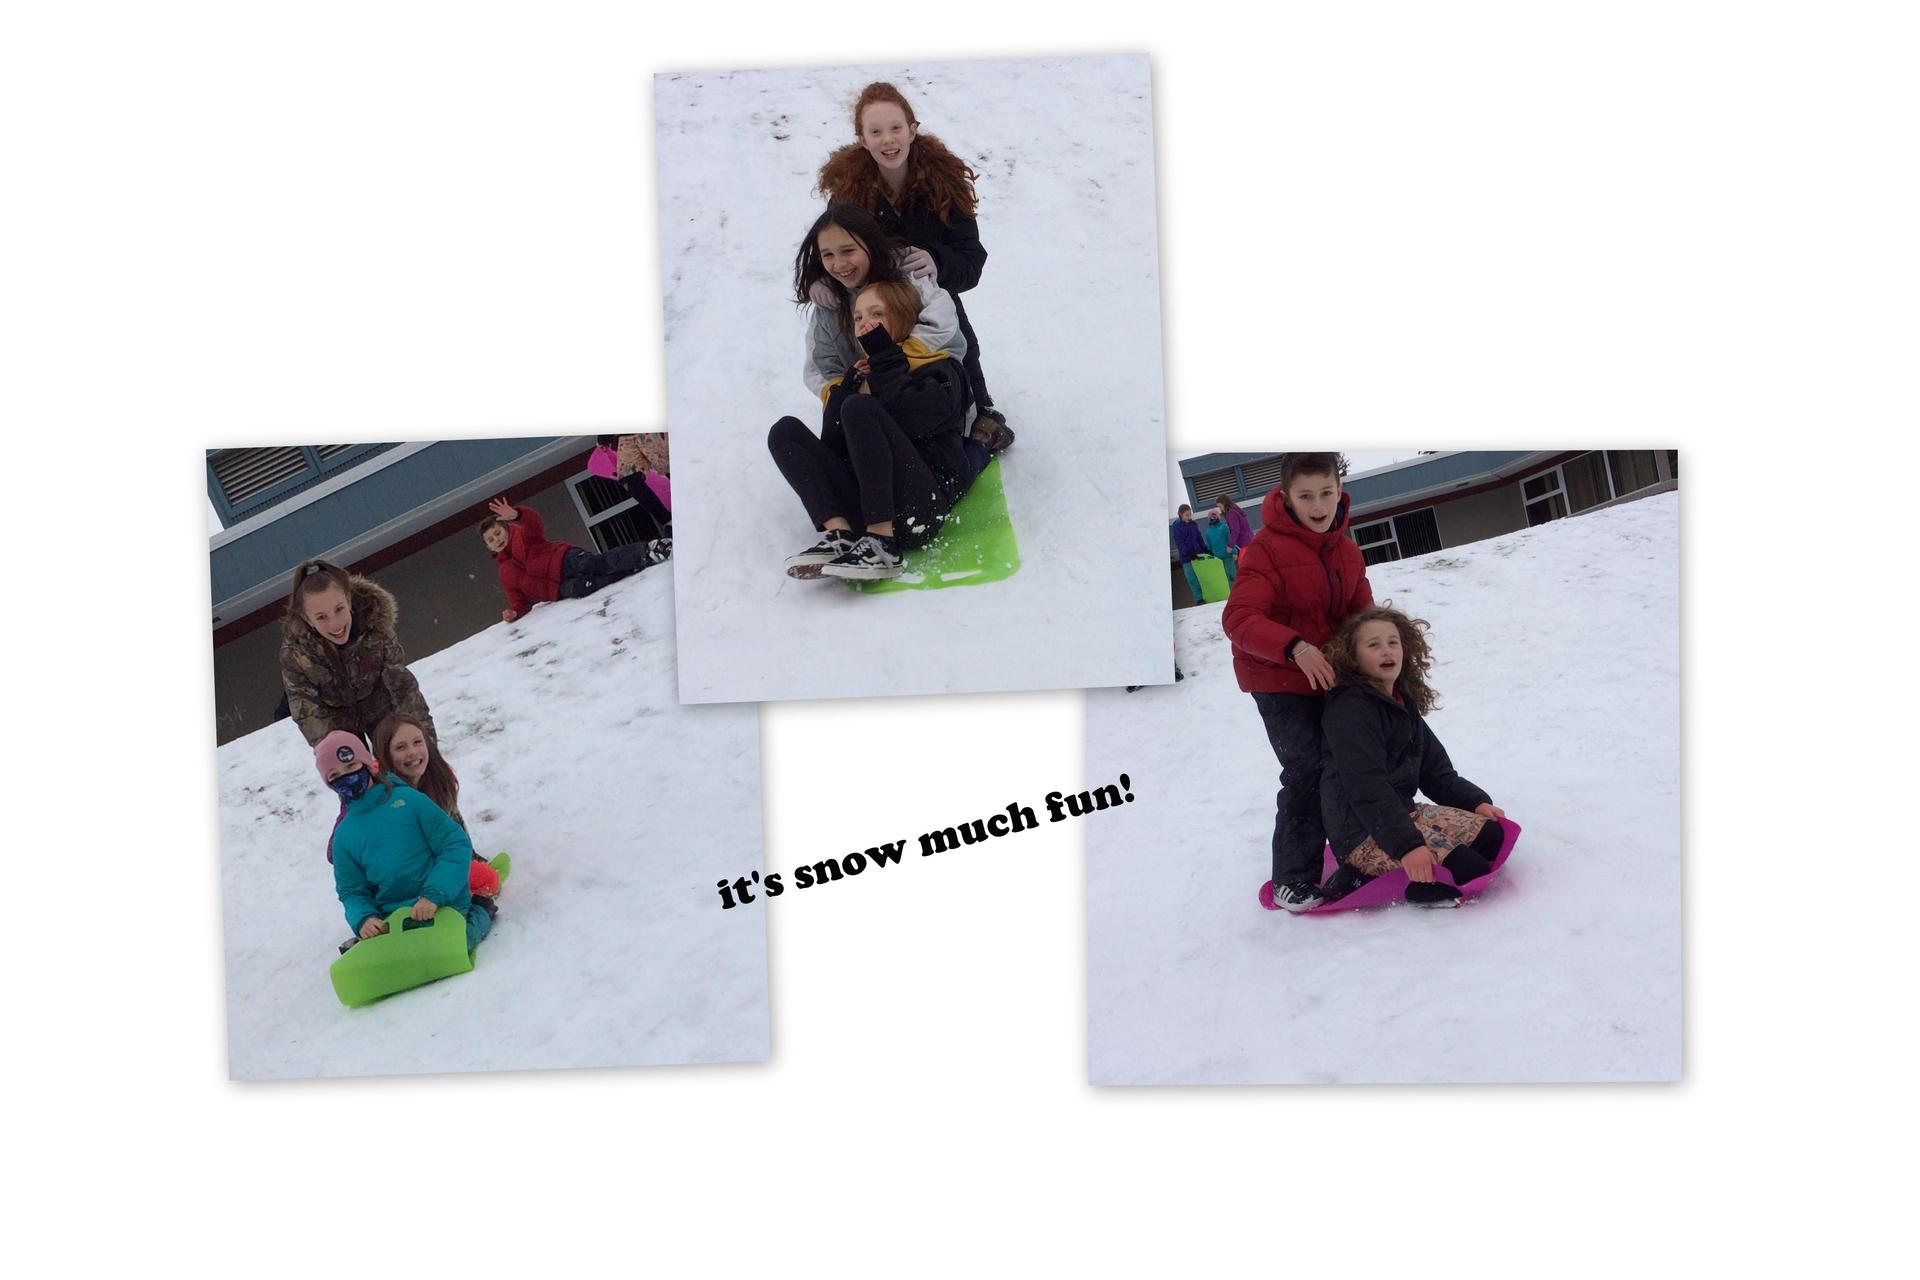 It's snow much fun sledding